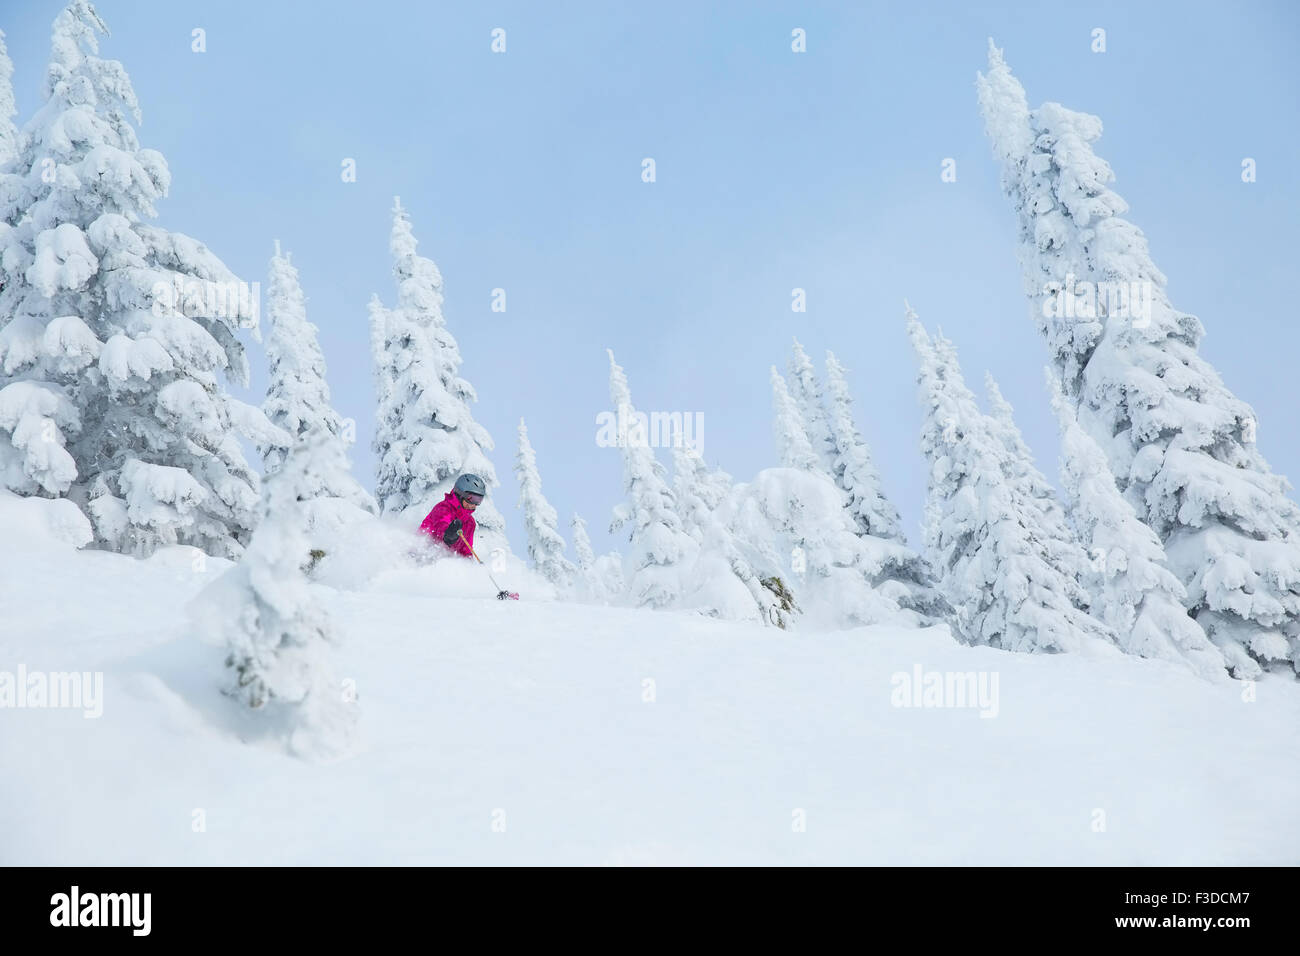 Low angle view of mature woman on ski slope - Stock Image